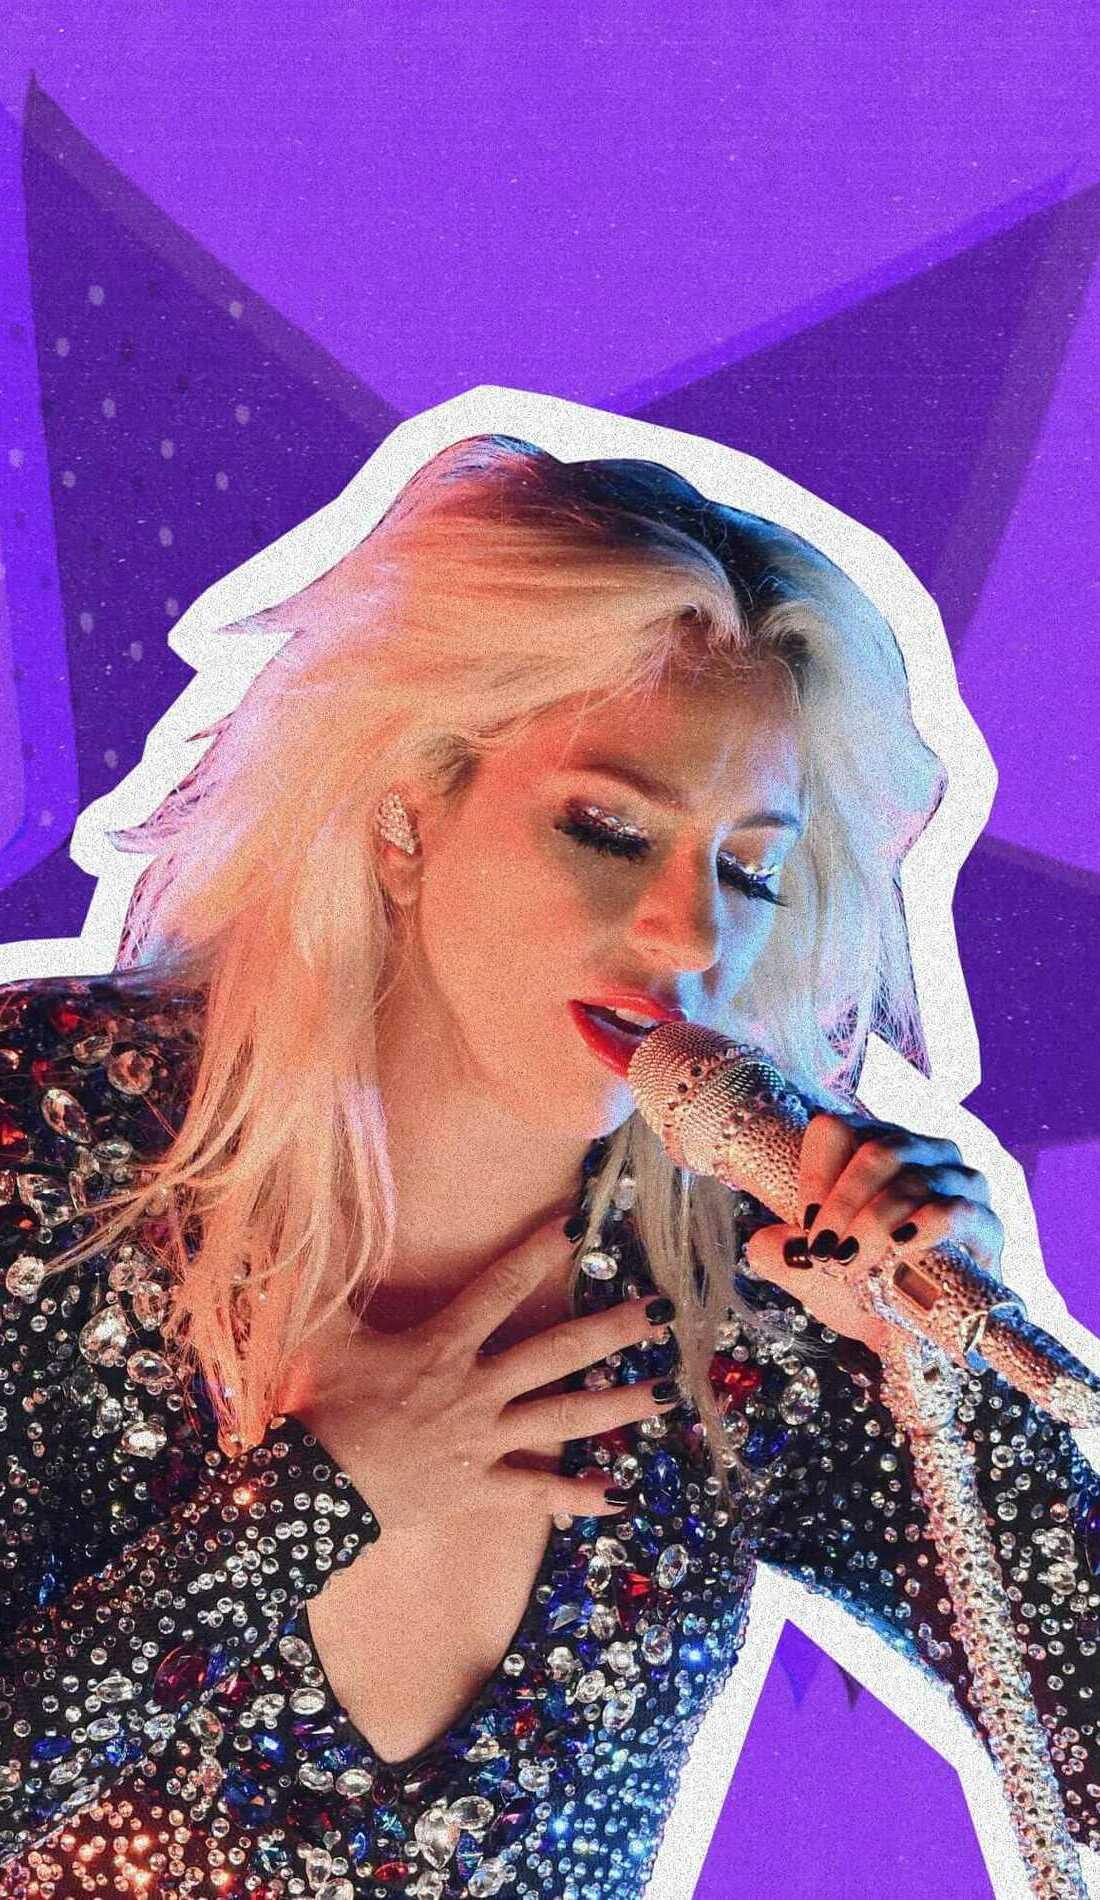 A Lady Gaga live event